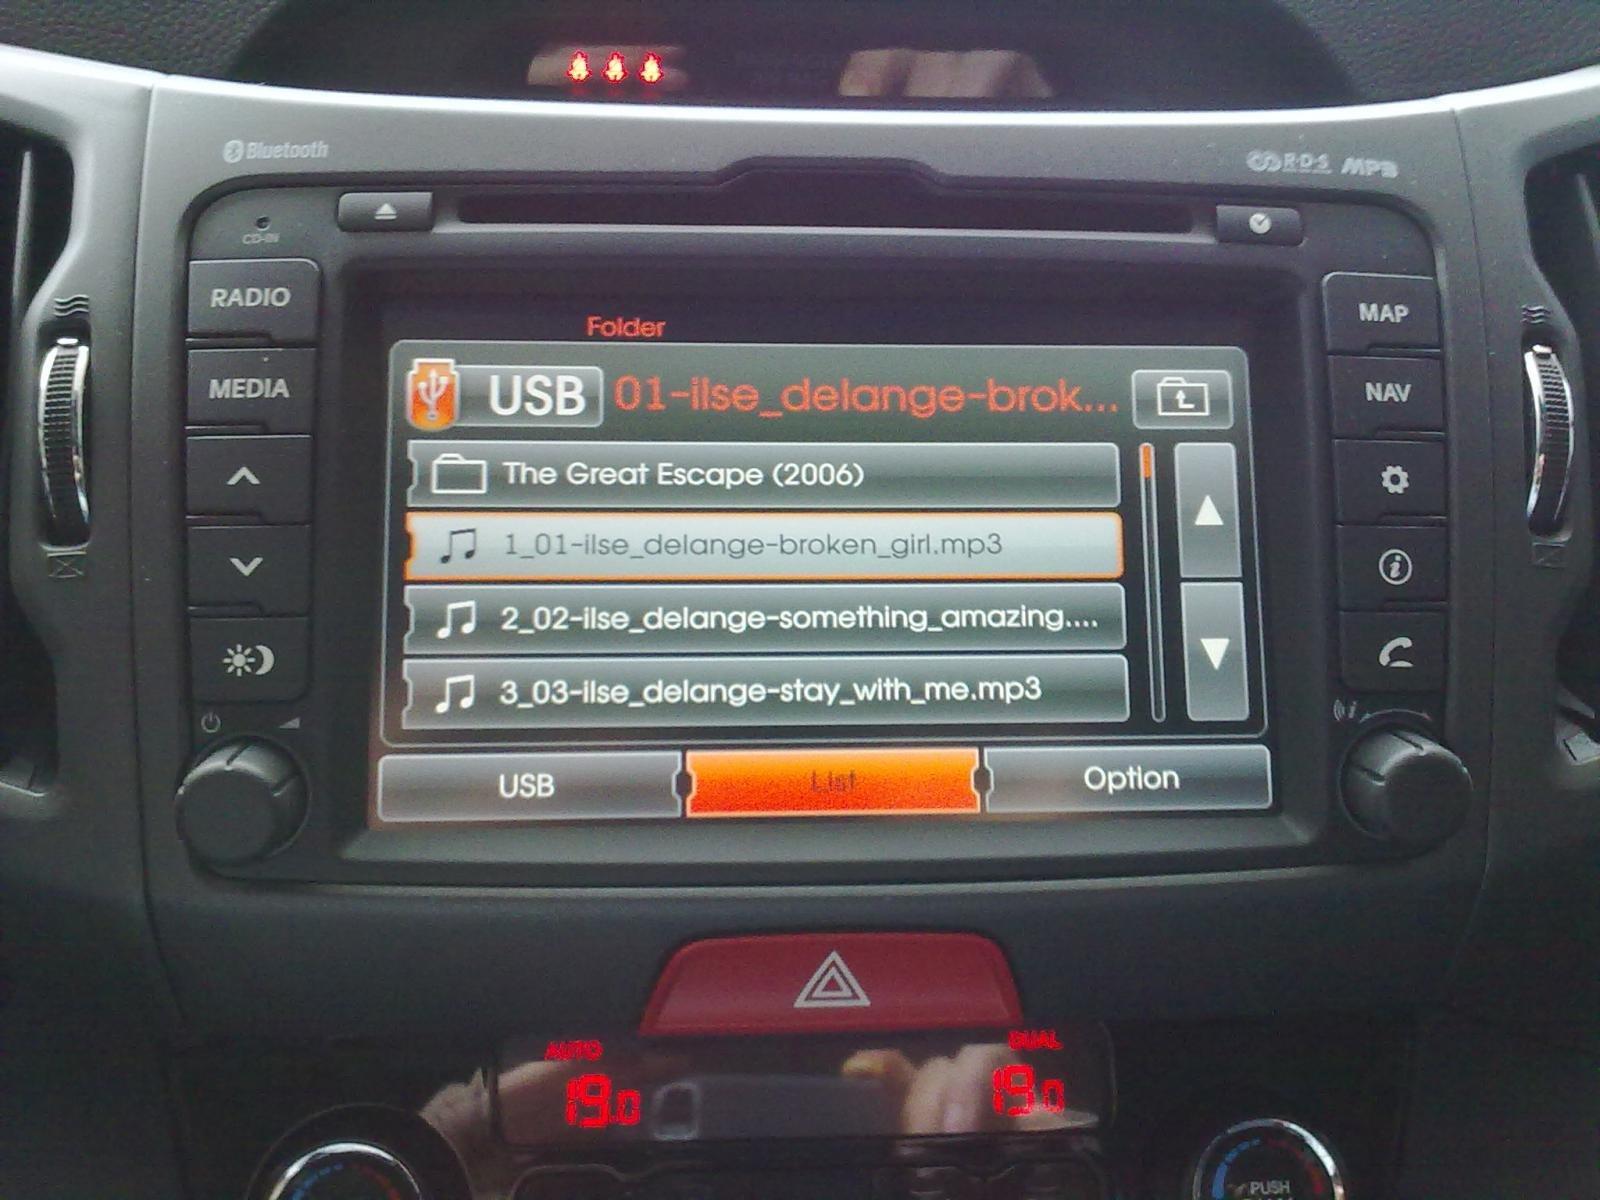 Kia Sportage Questions - kia sportage sat nav stereo reset - CarGurus